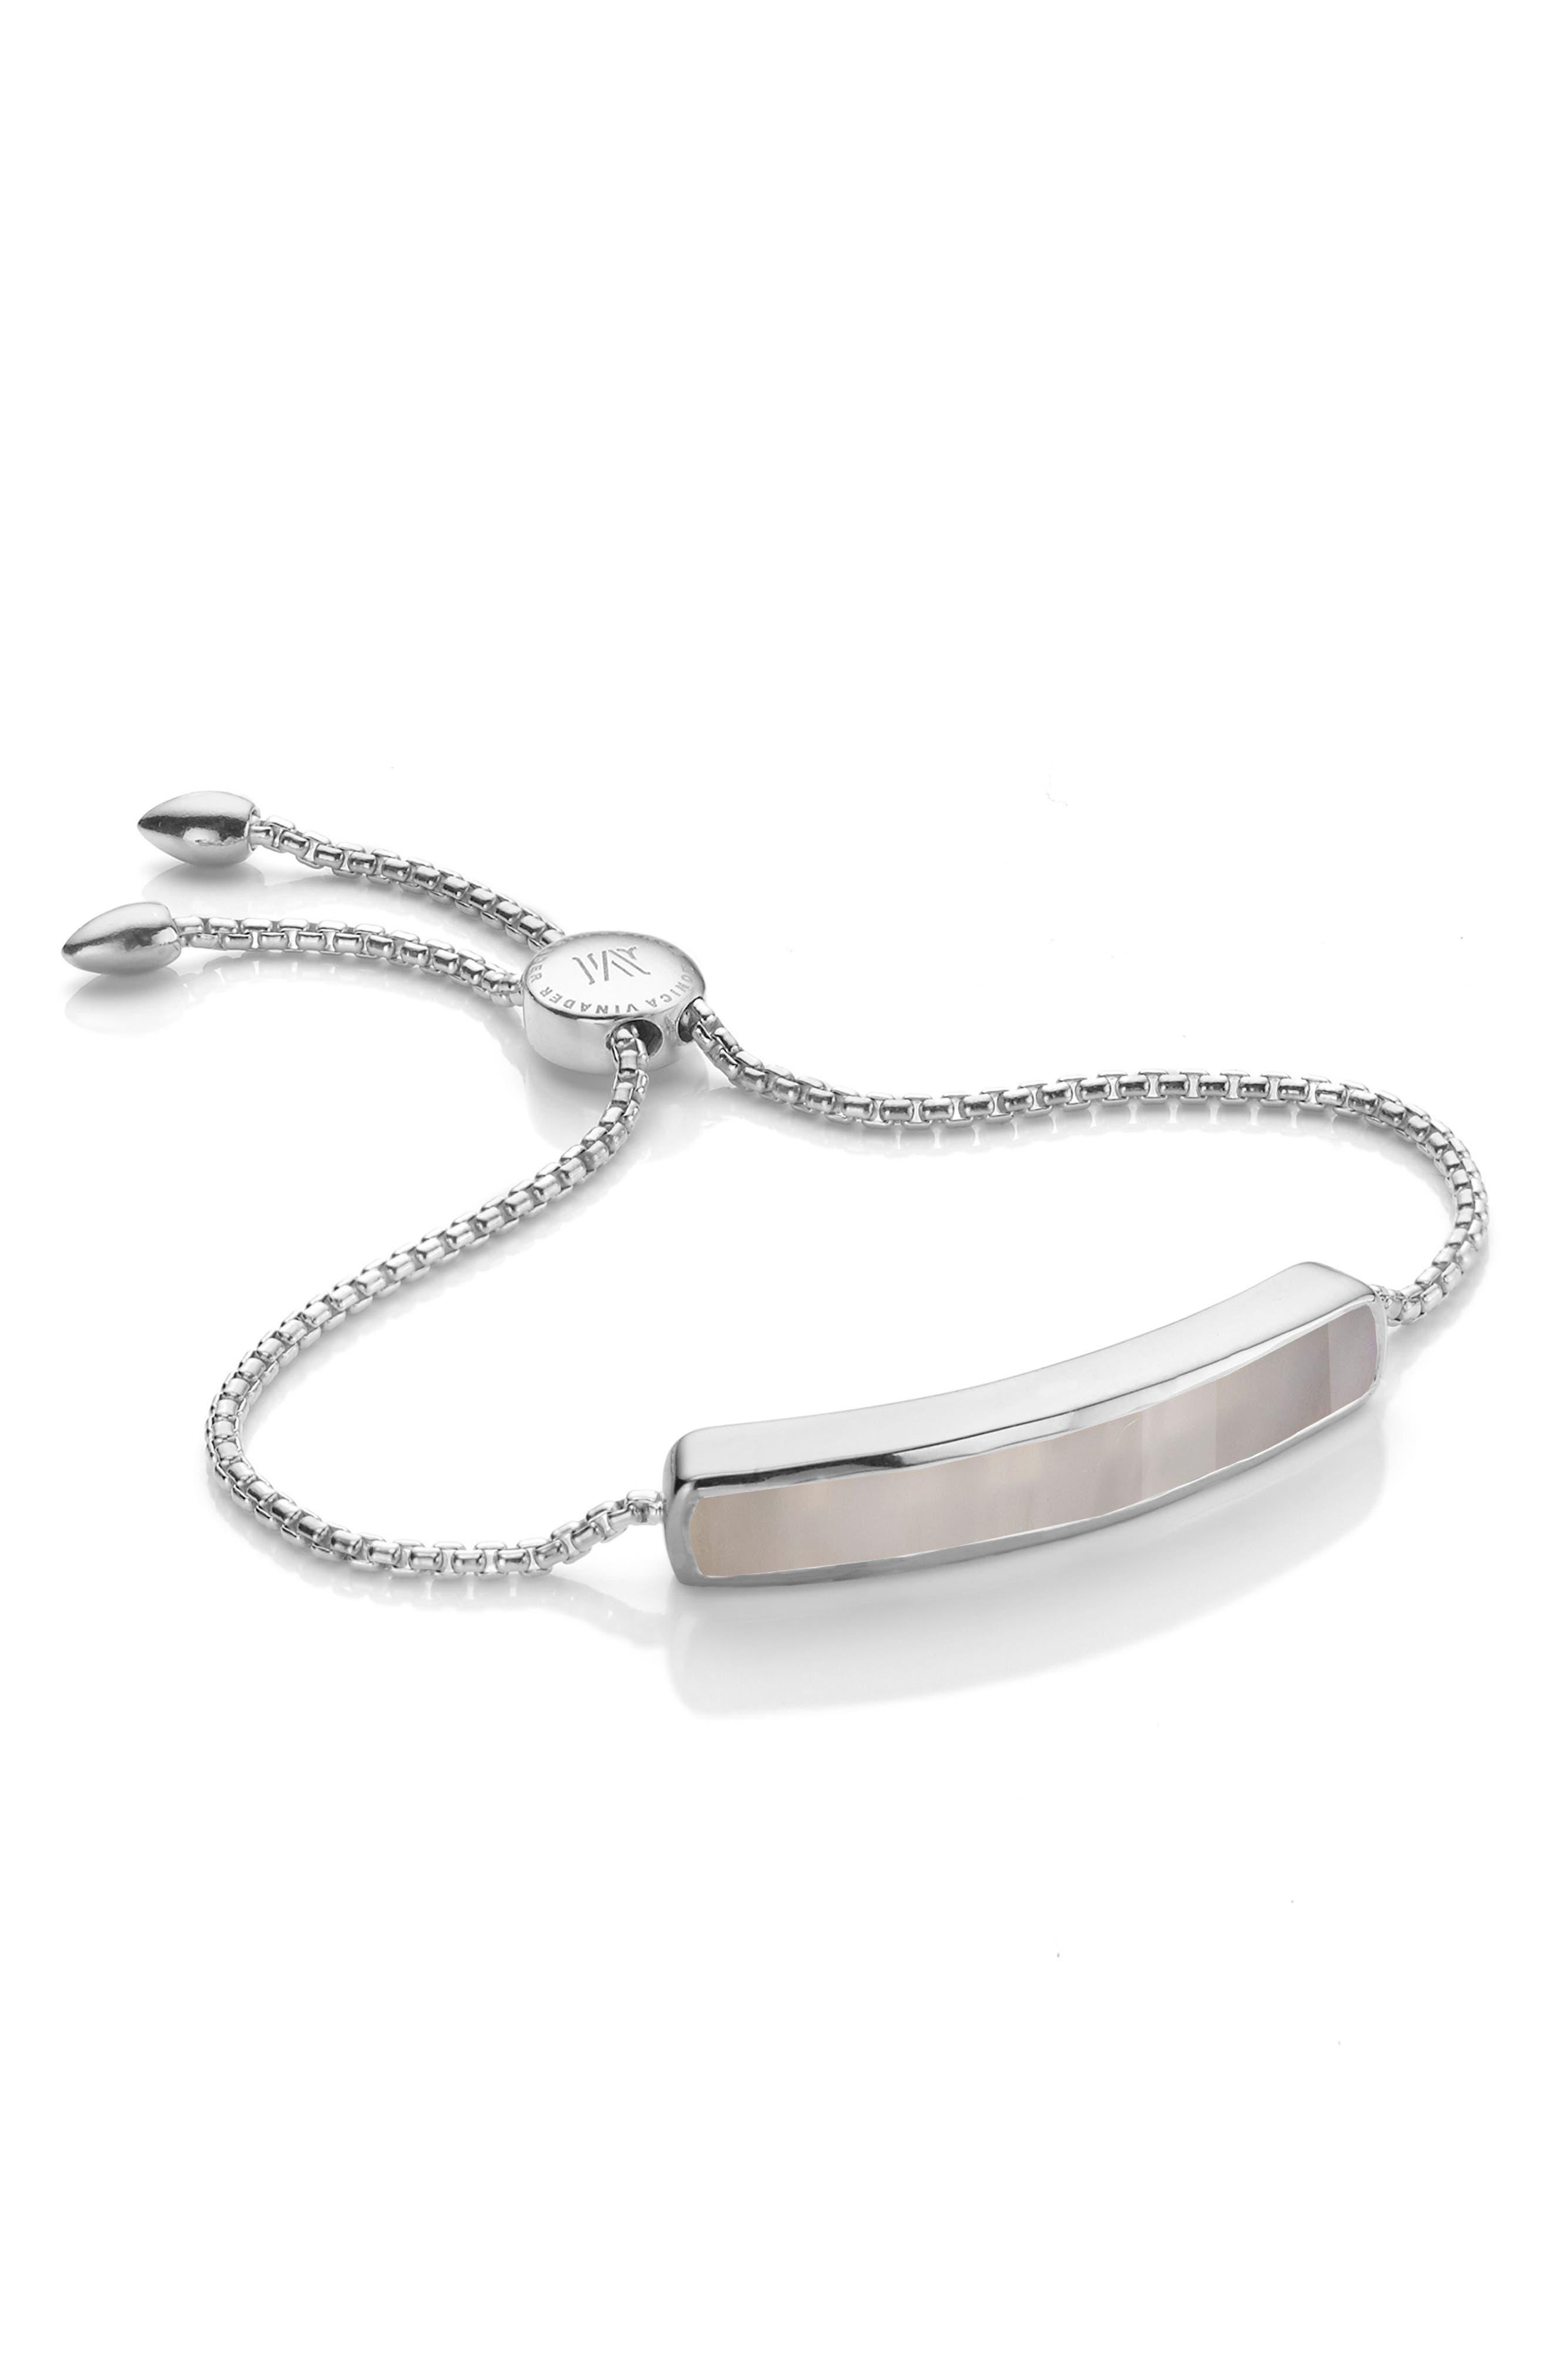 Baja Sterling Stone Bracelet,                             Main thumbnail 1, color,                             GREY AGATE/ SILVER